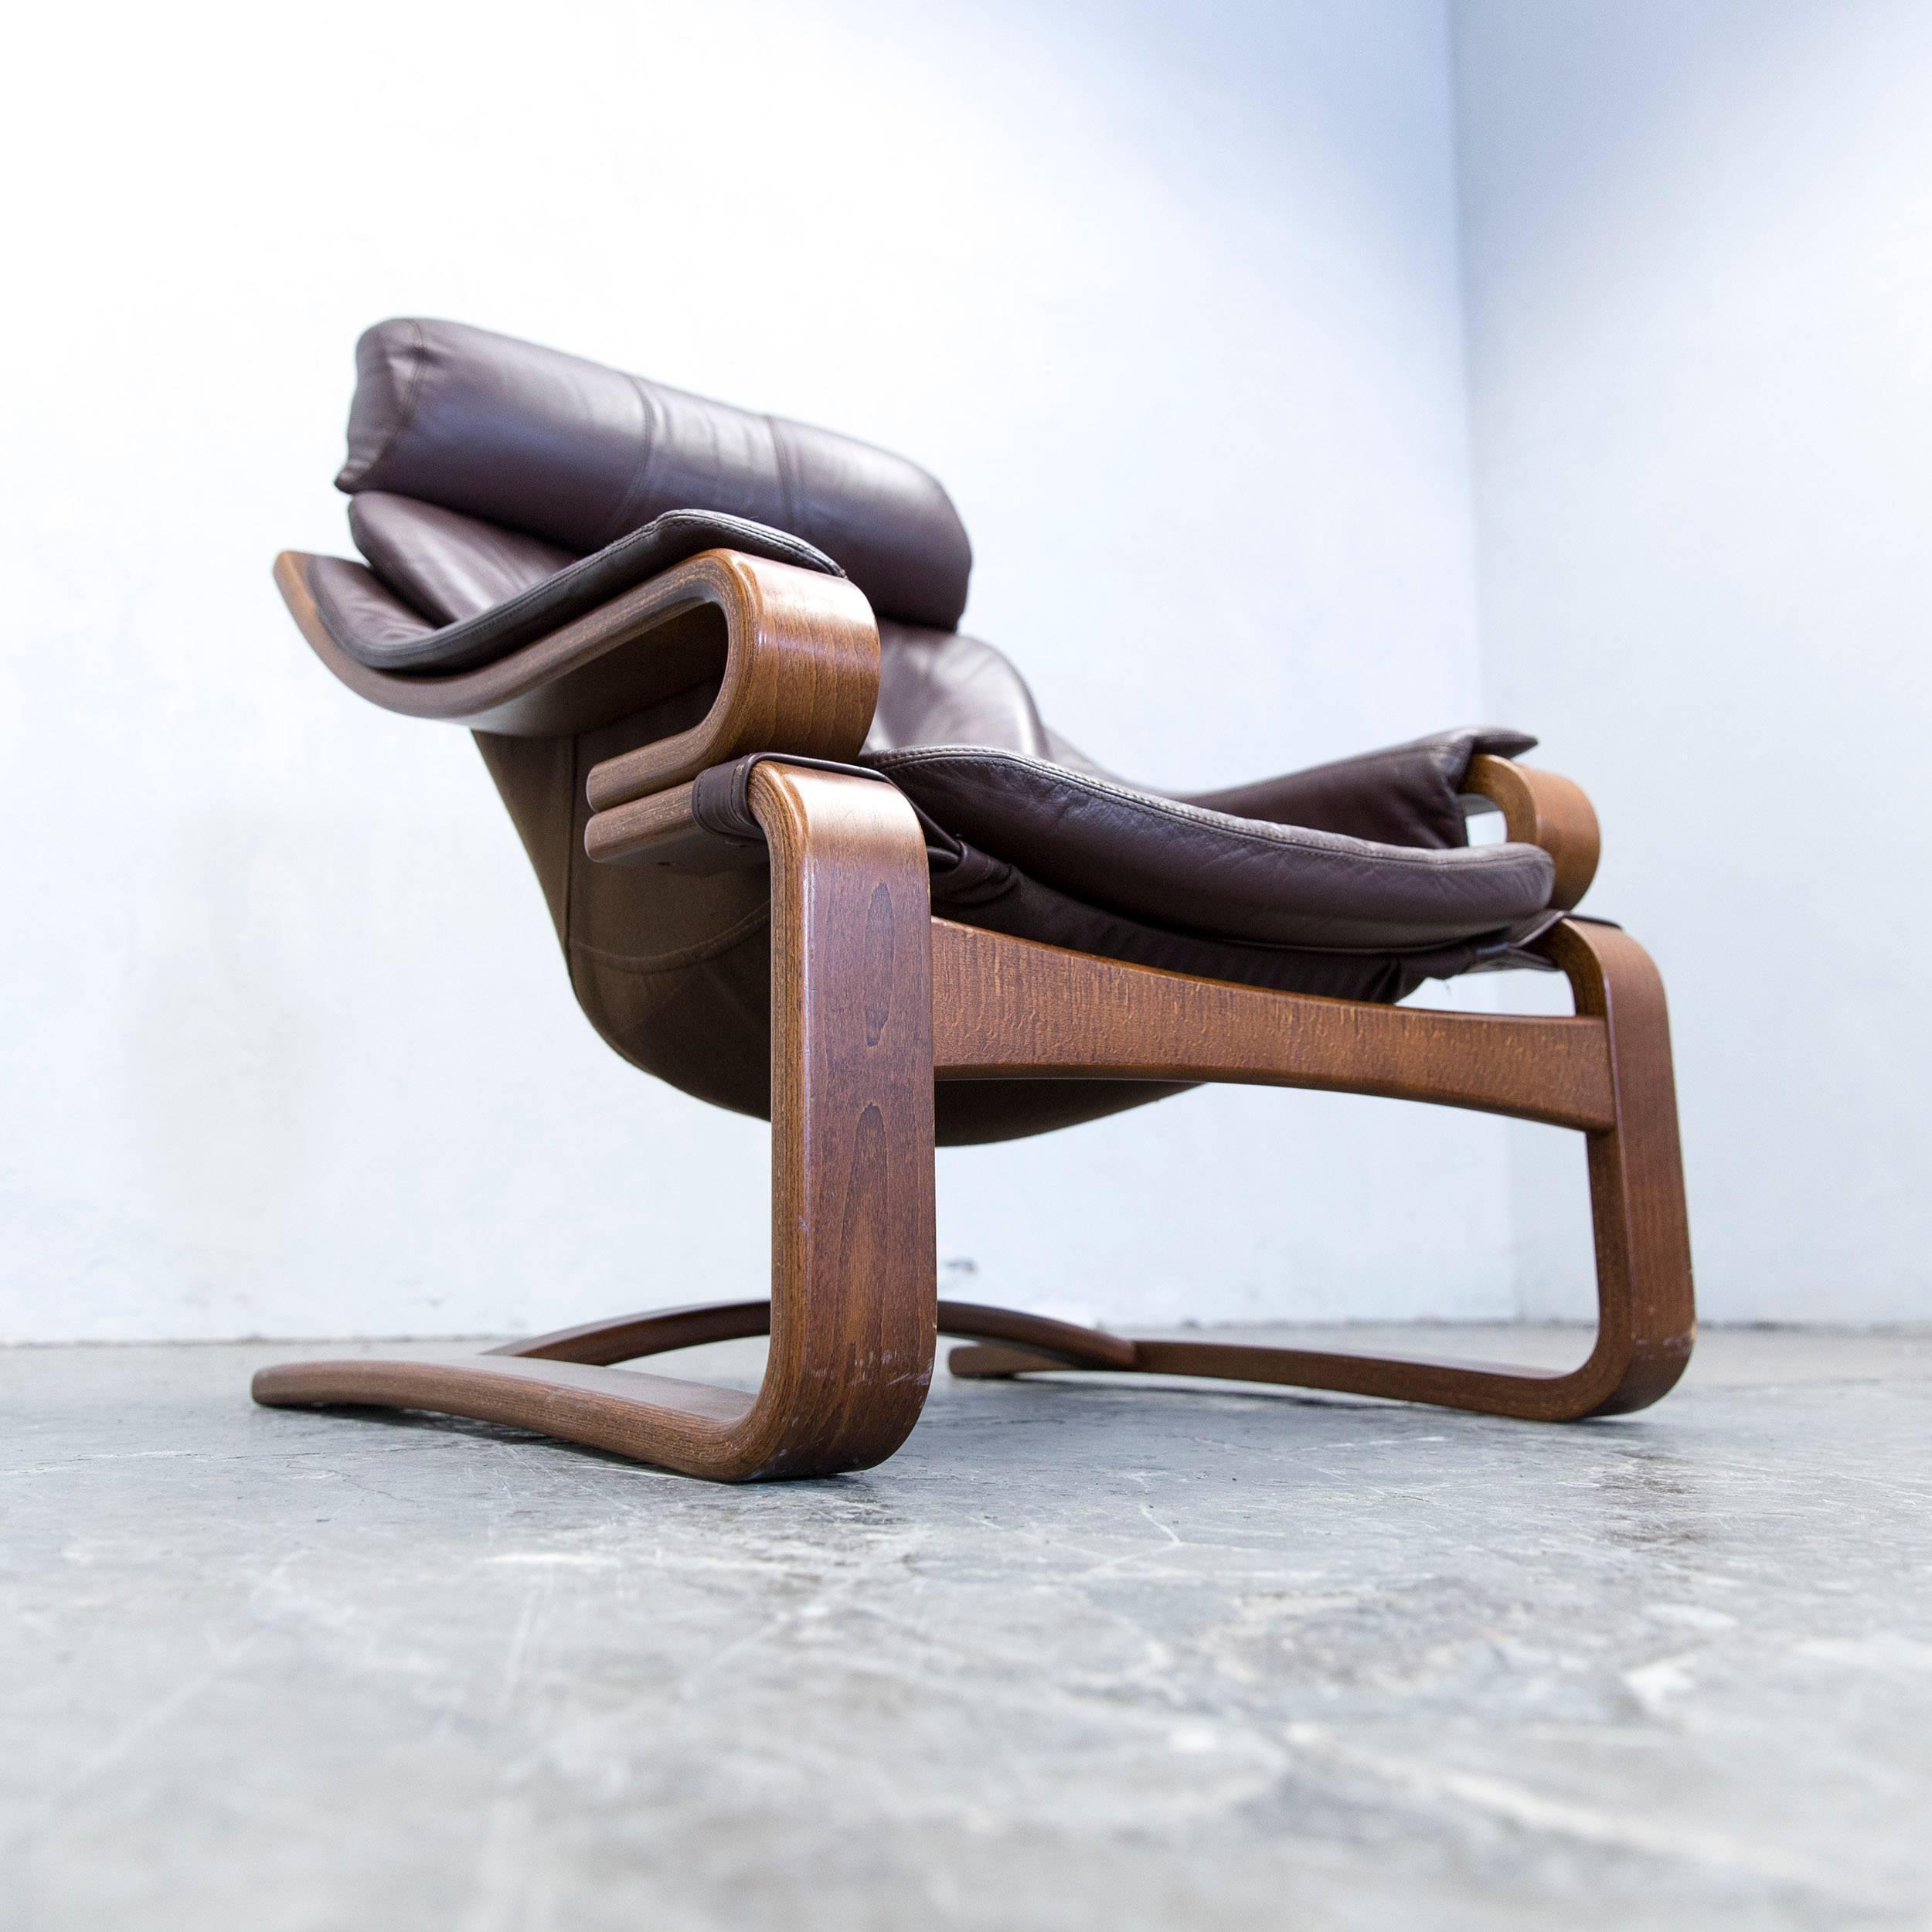 sessel leder braun good ohrensessel gebraucht ohrensessel leder braun gebraucht sessel modern. Black Bedroom Furniture Sets. Home Design Ideas